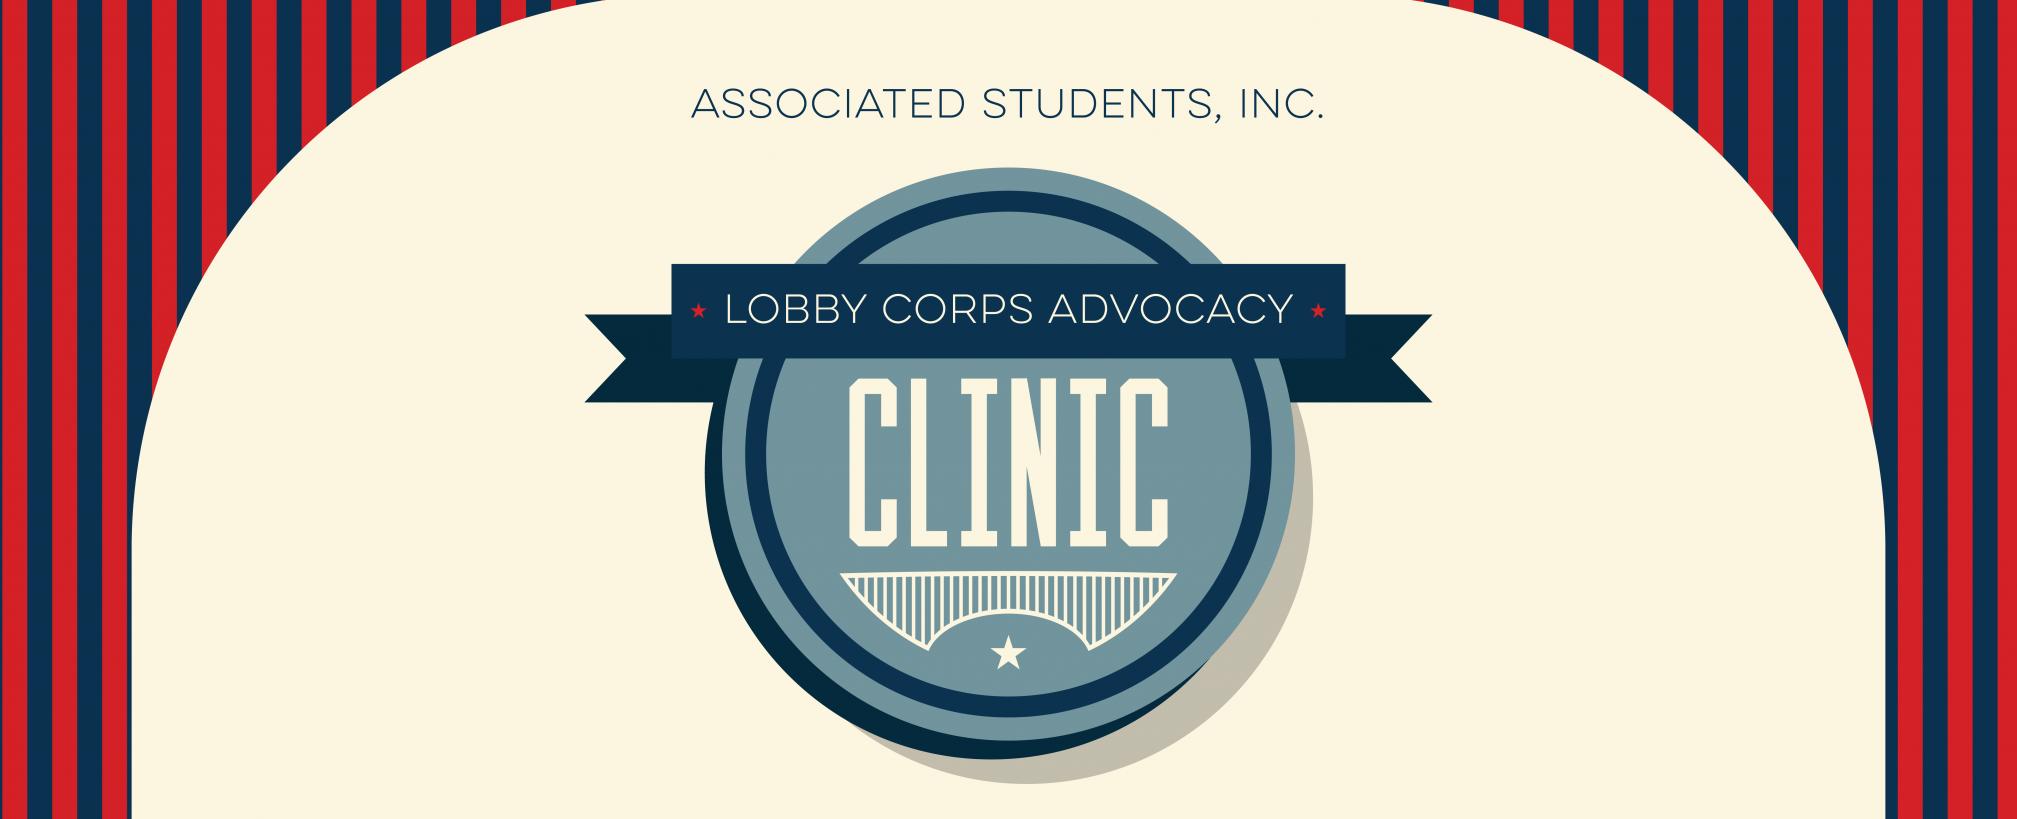 LOBBY CORPS ADVOCACY CLINIC